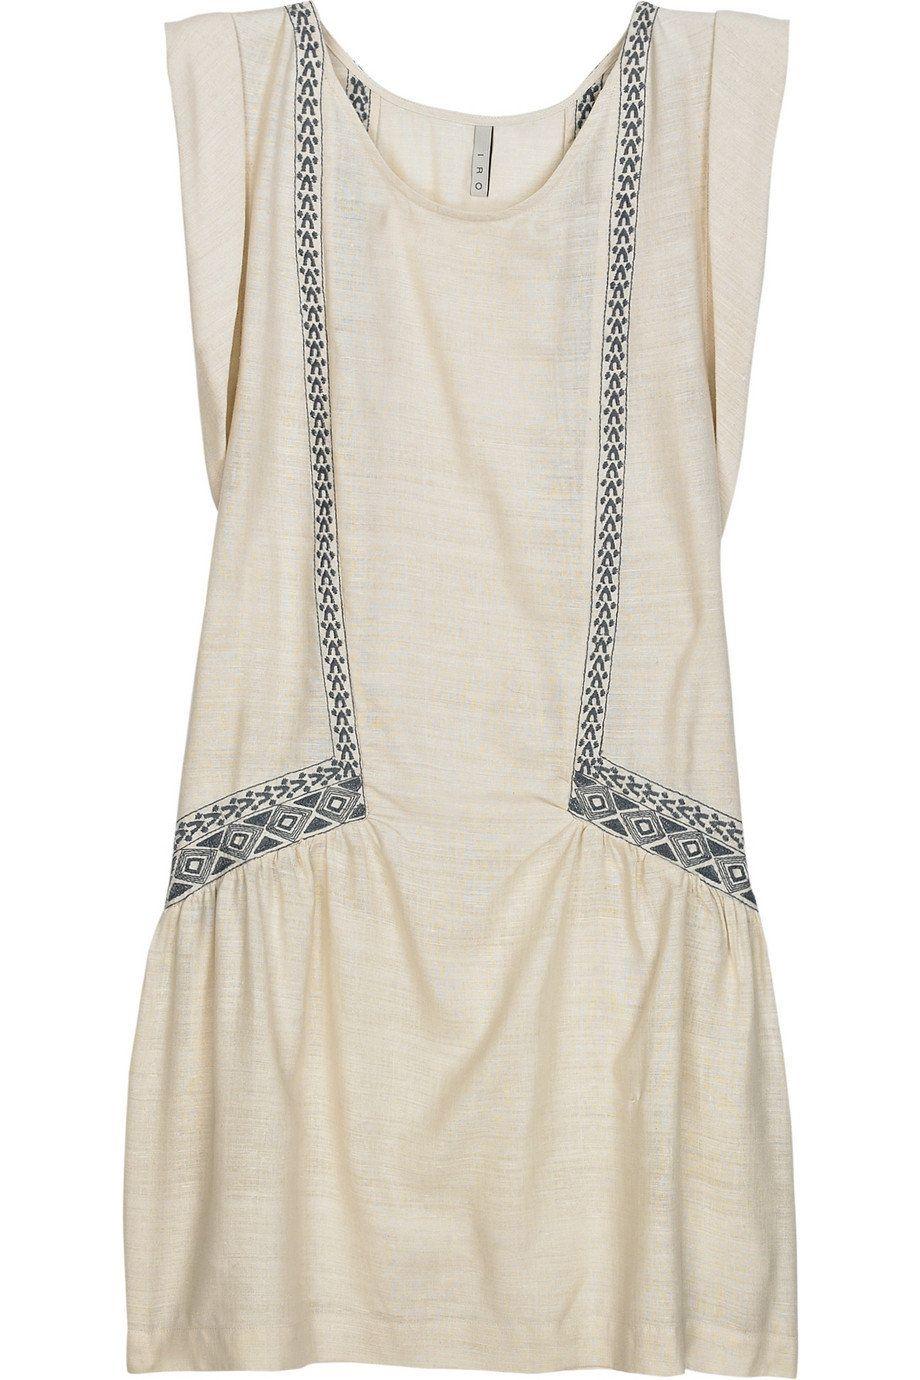 dress, silk - iro raveh